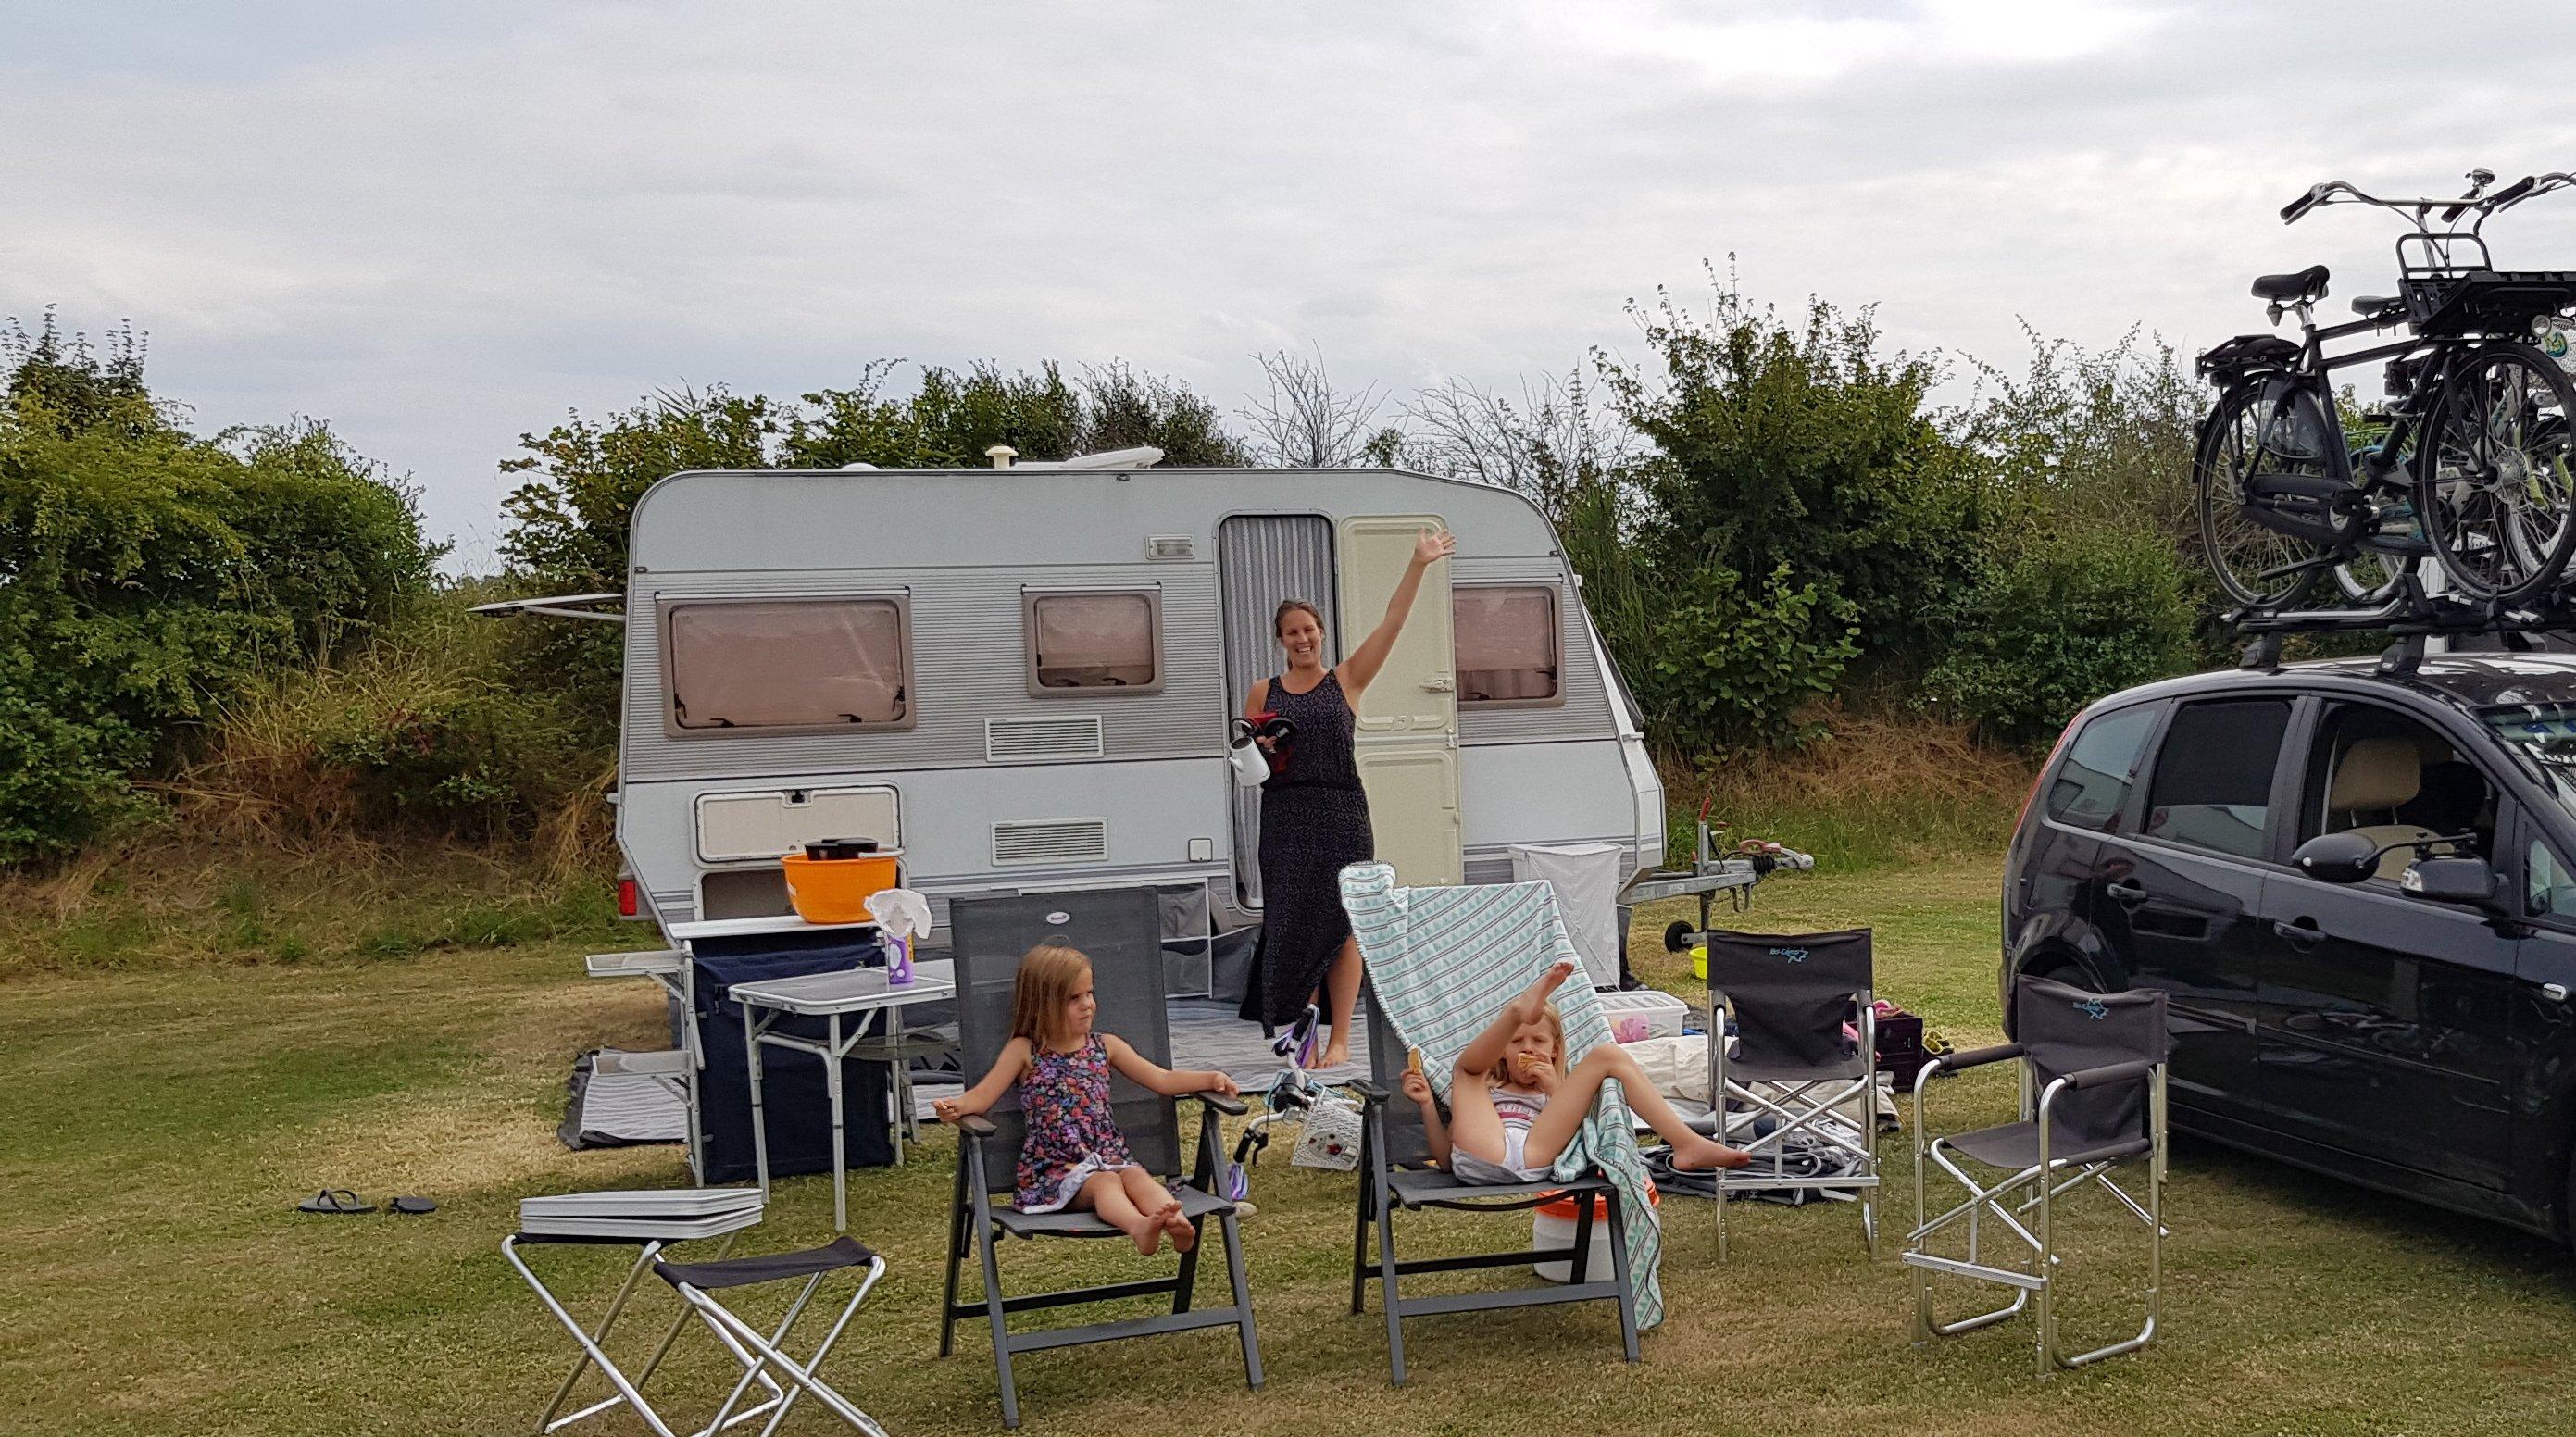 Caravan fietsendrager campingstoel